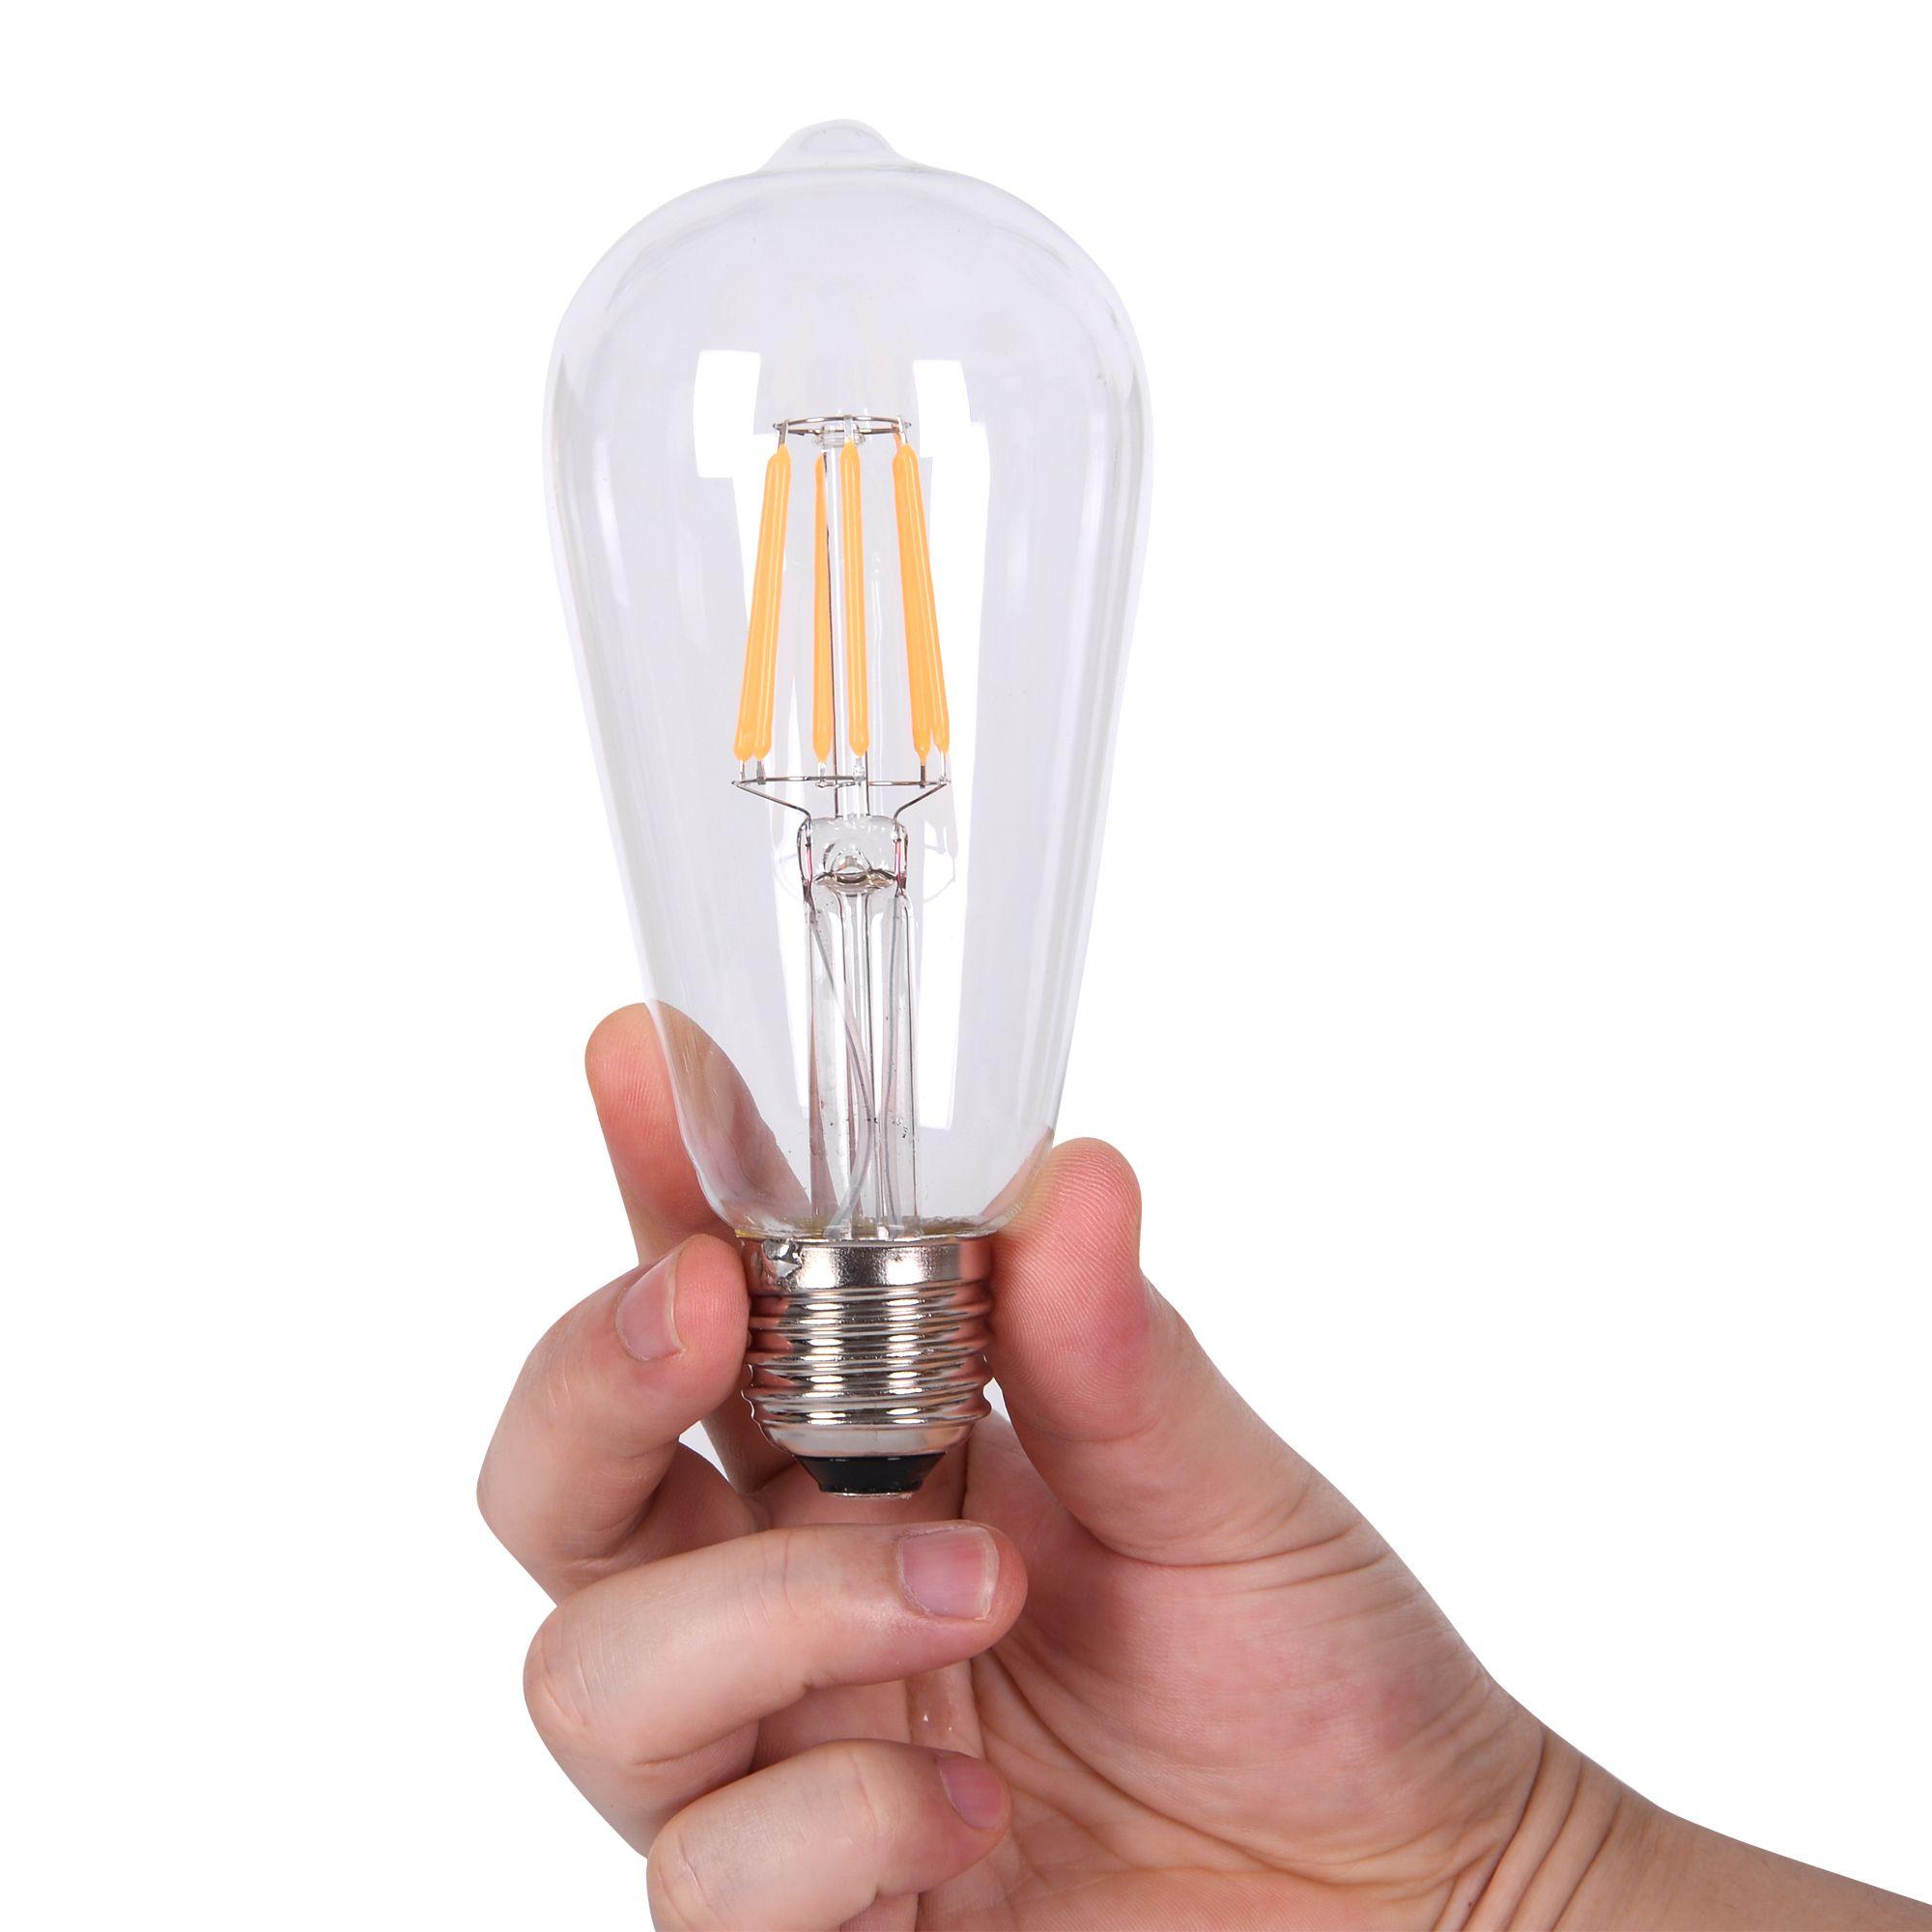 Retro Look With Modern Technology Vintage Edison Led Light Bulbs